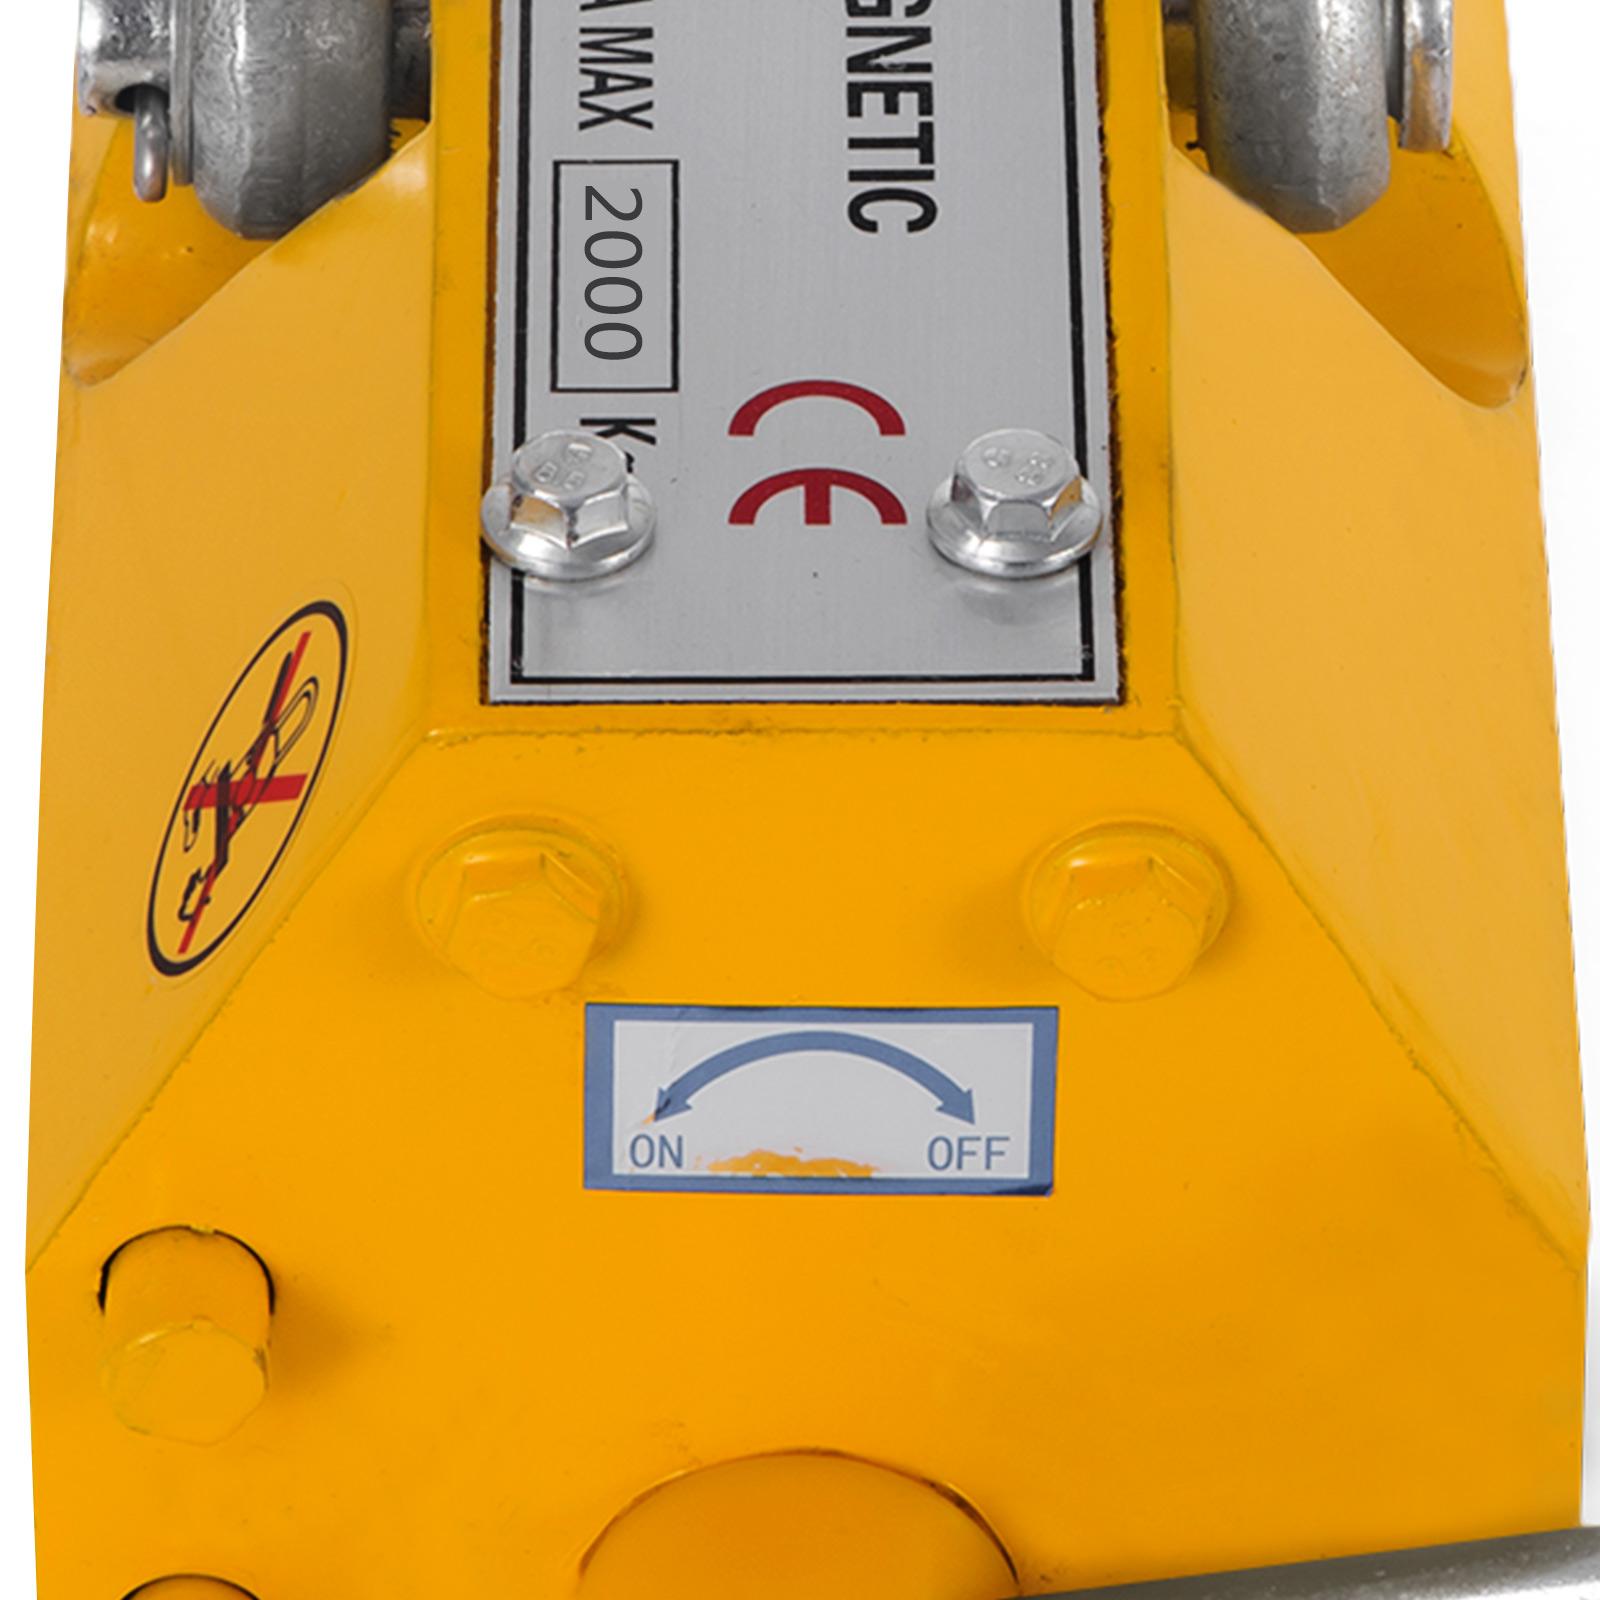 100-300-600-1000KG-Steel-Magnetic-Lifter-Heavy-Duty-Crane-Hoist-Lifting-Magnet miniature 93